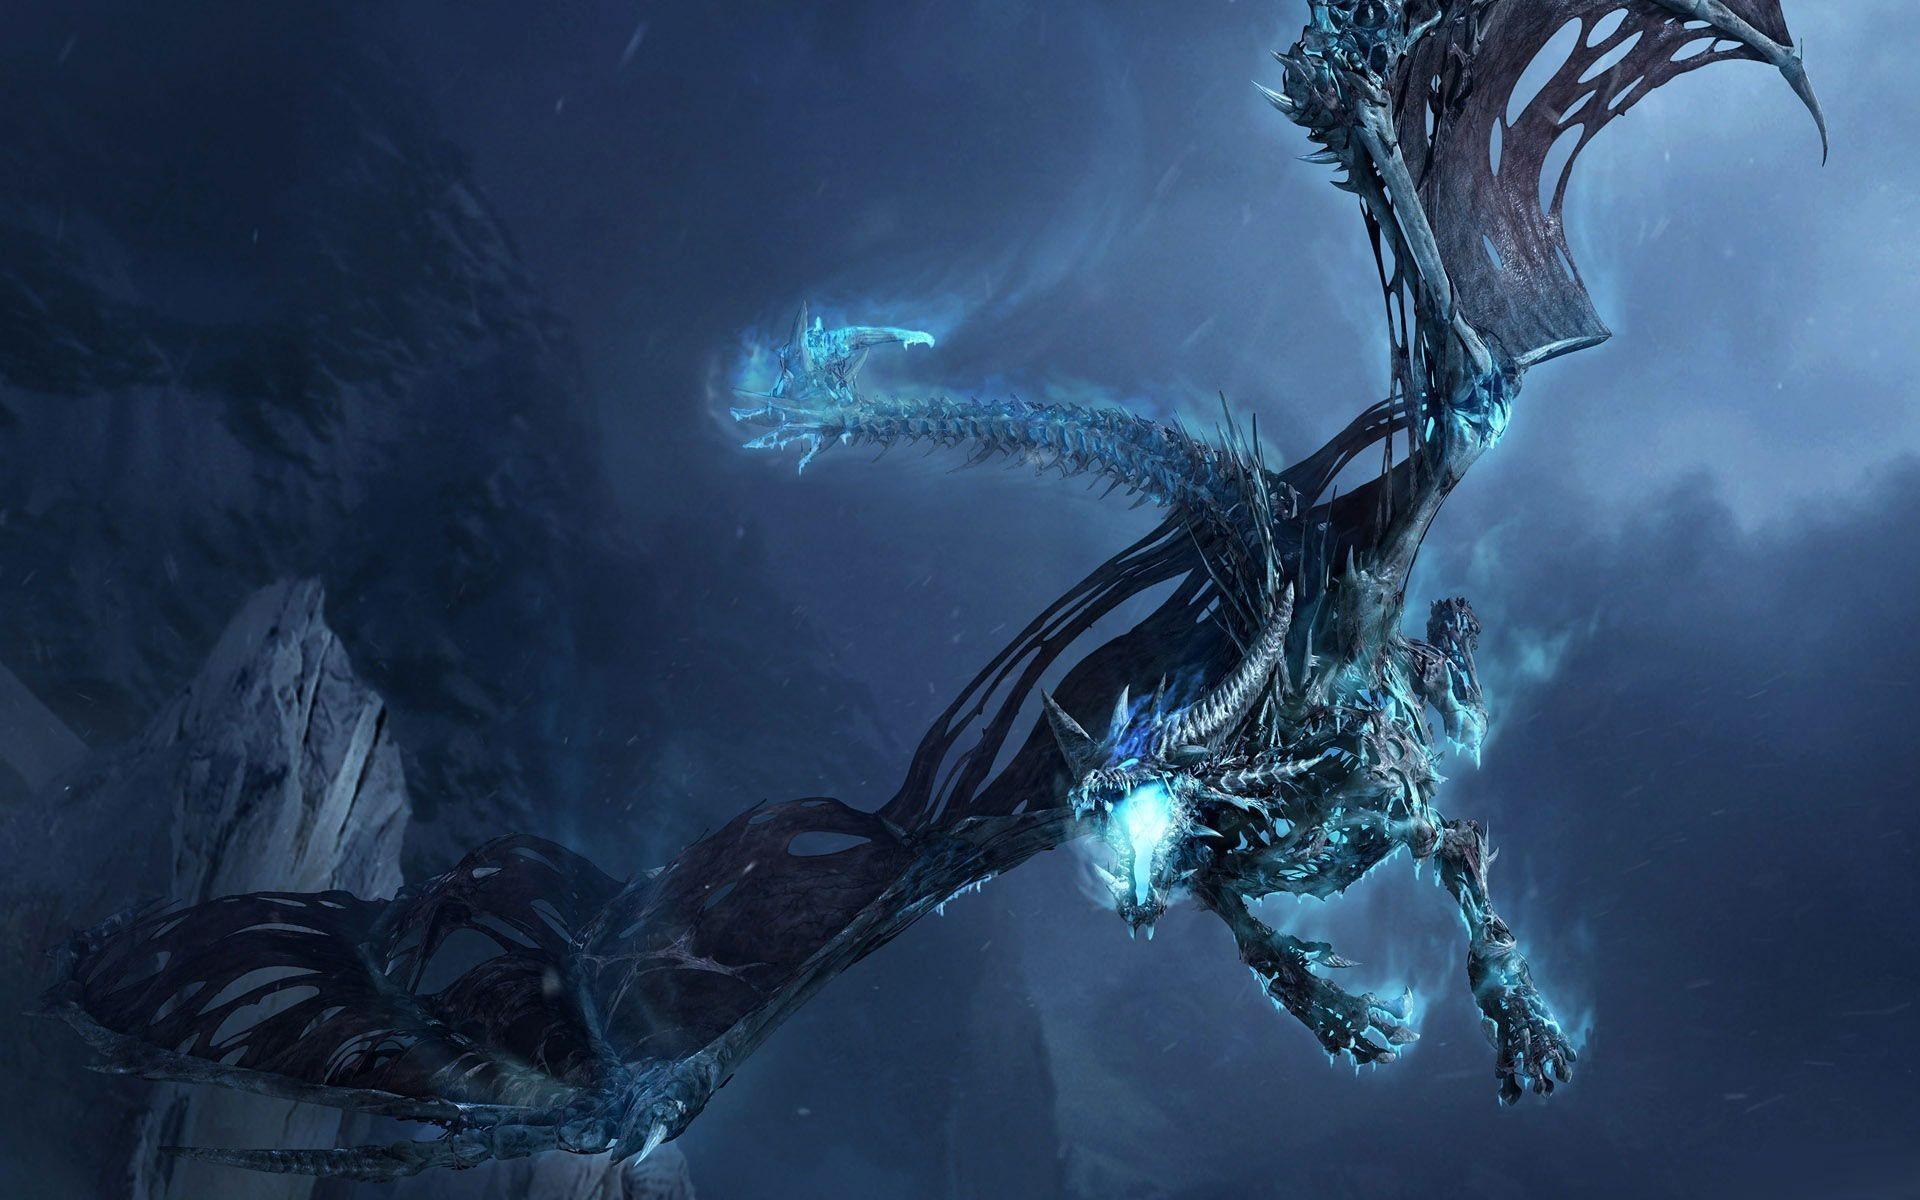 … cool blue wallpapers desktop background bhstorm com …